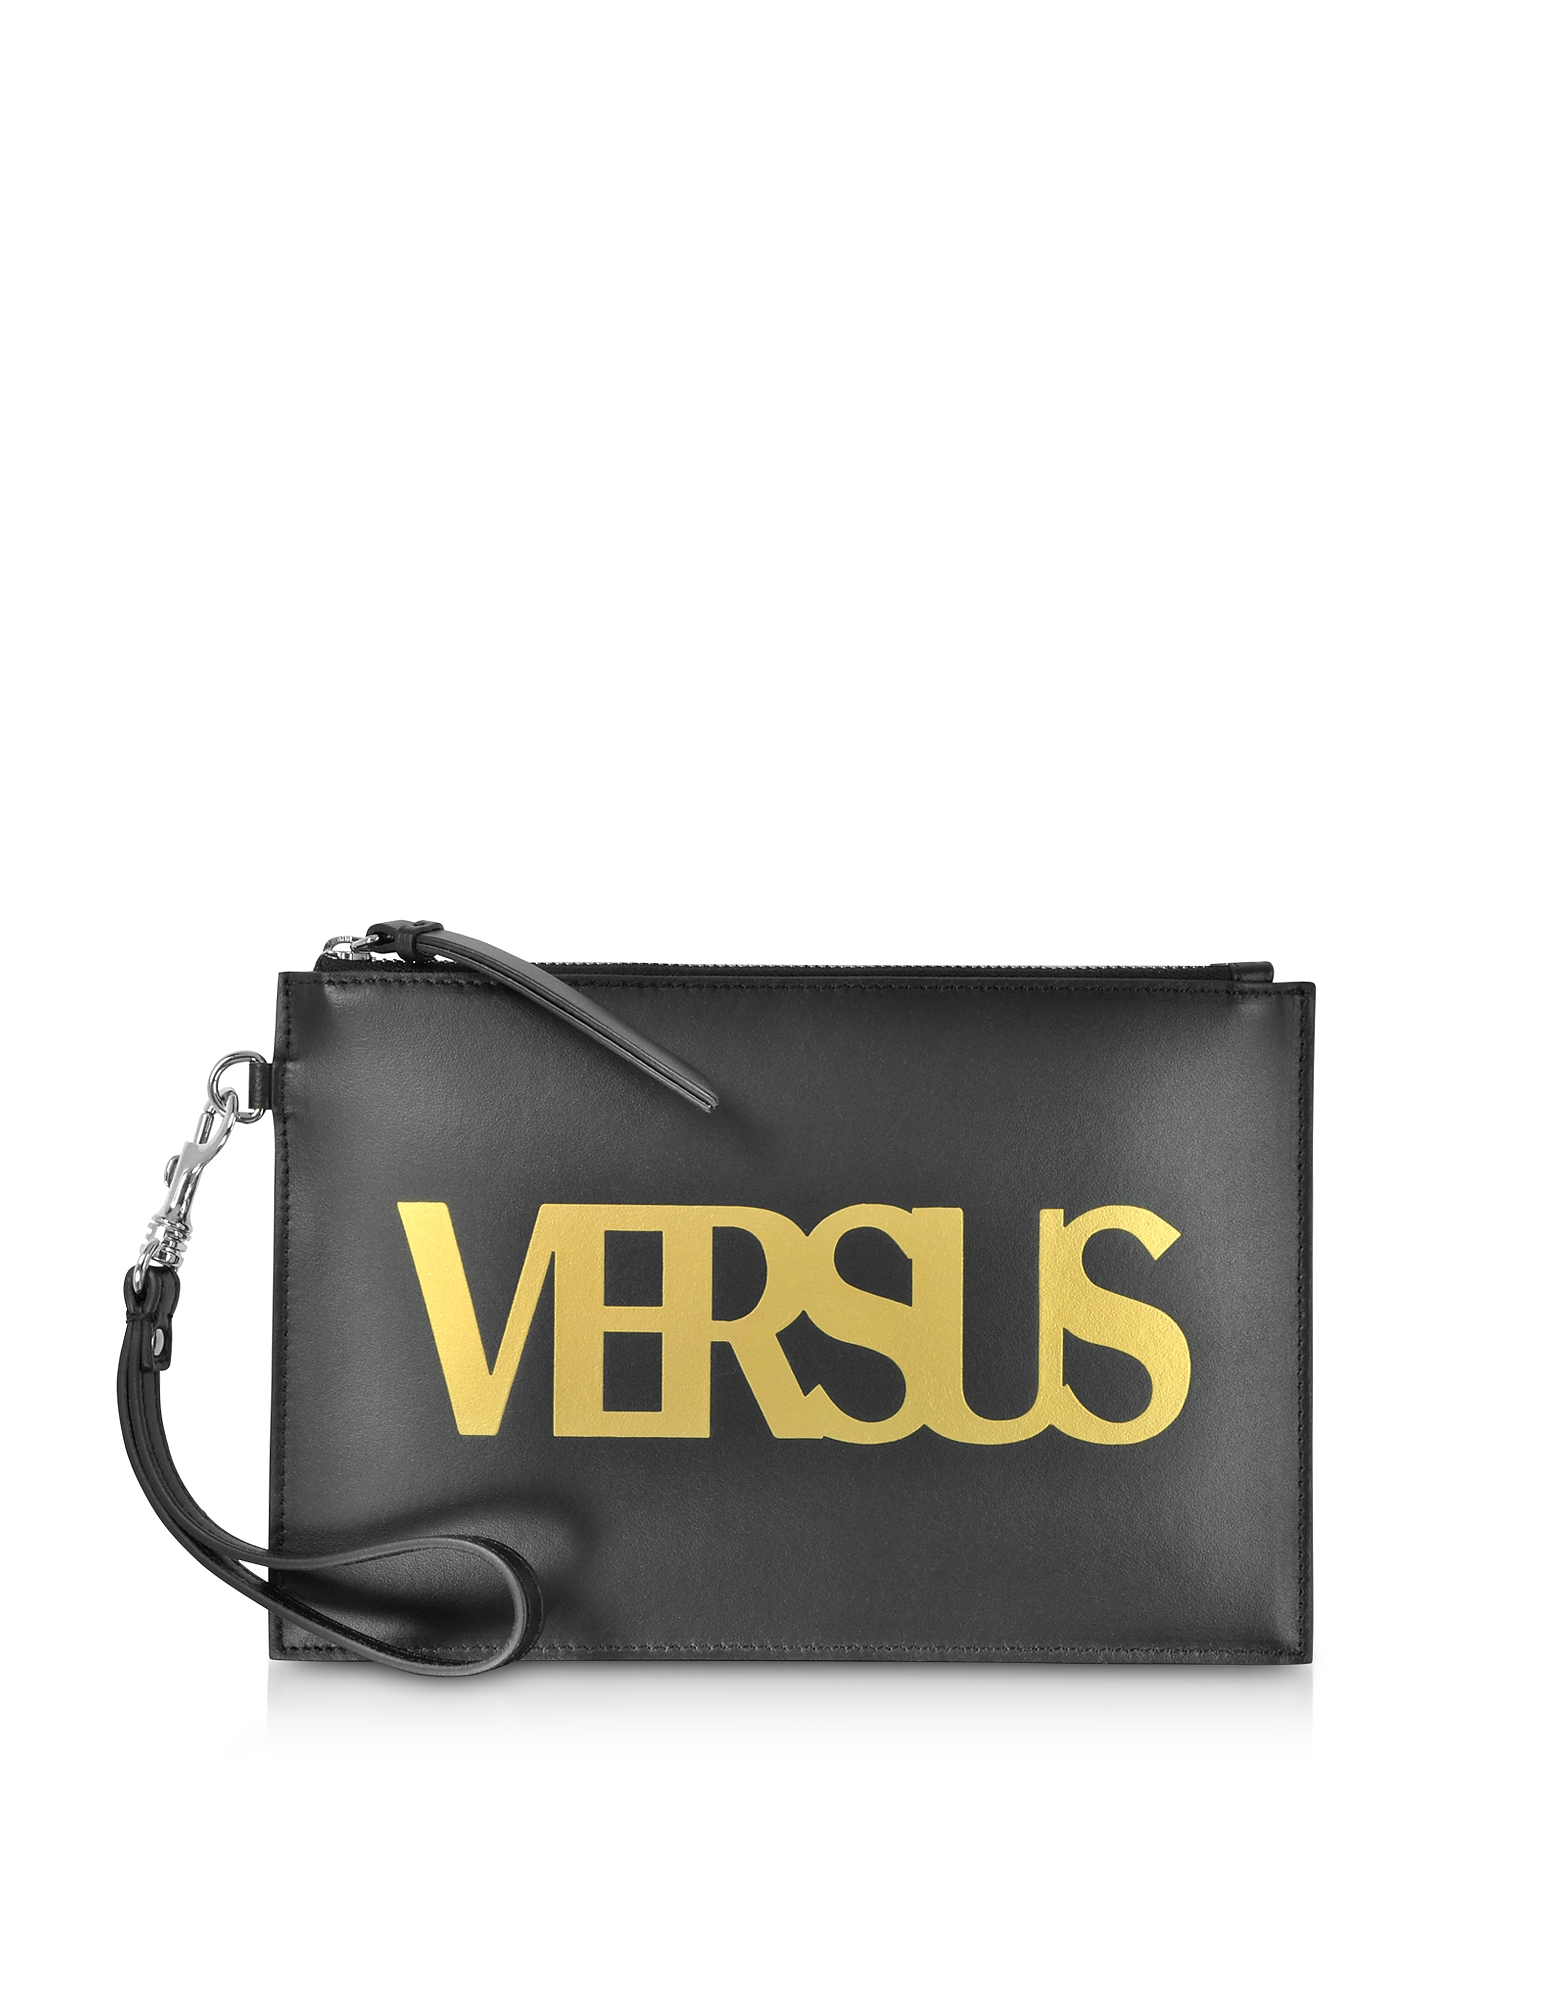 Image of Versace Versus Designer Handbags, Black Leather Versus Pouch